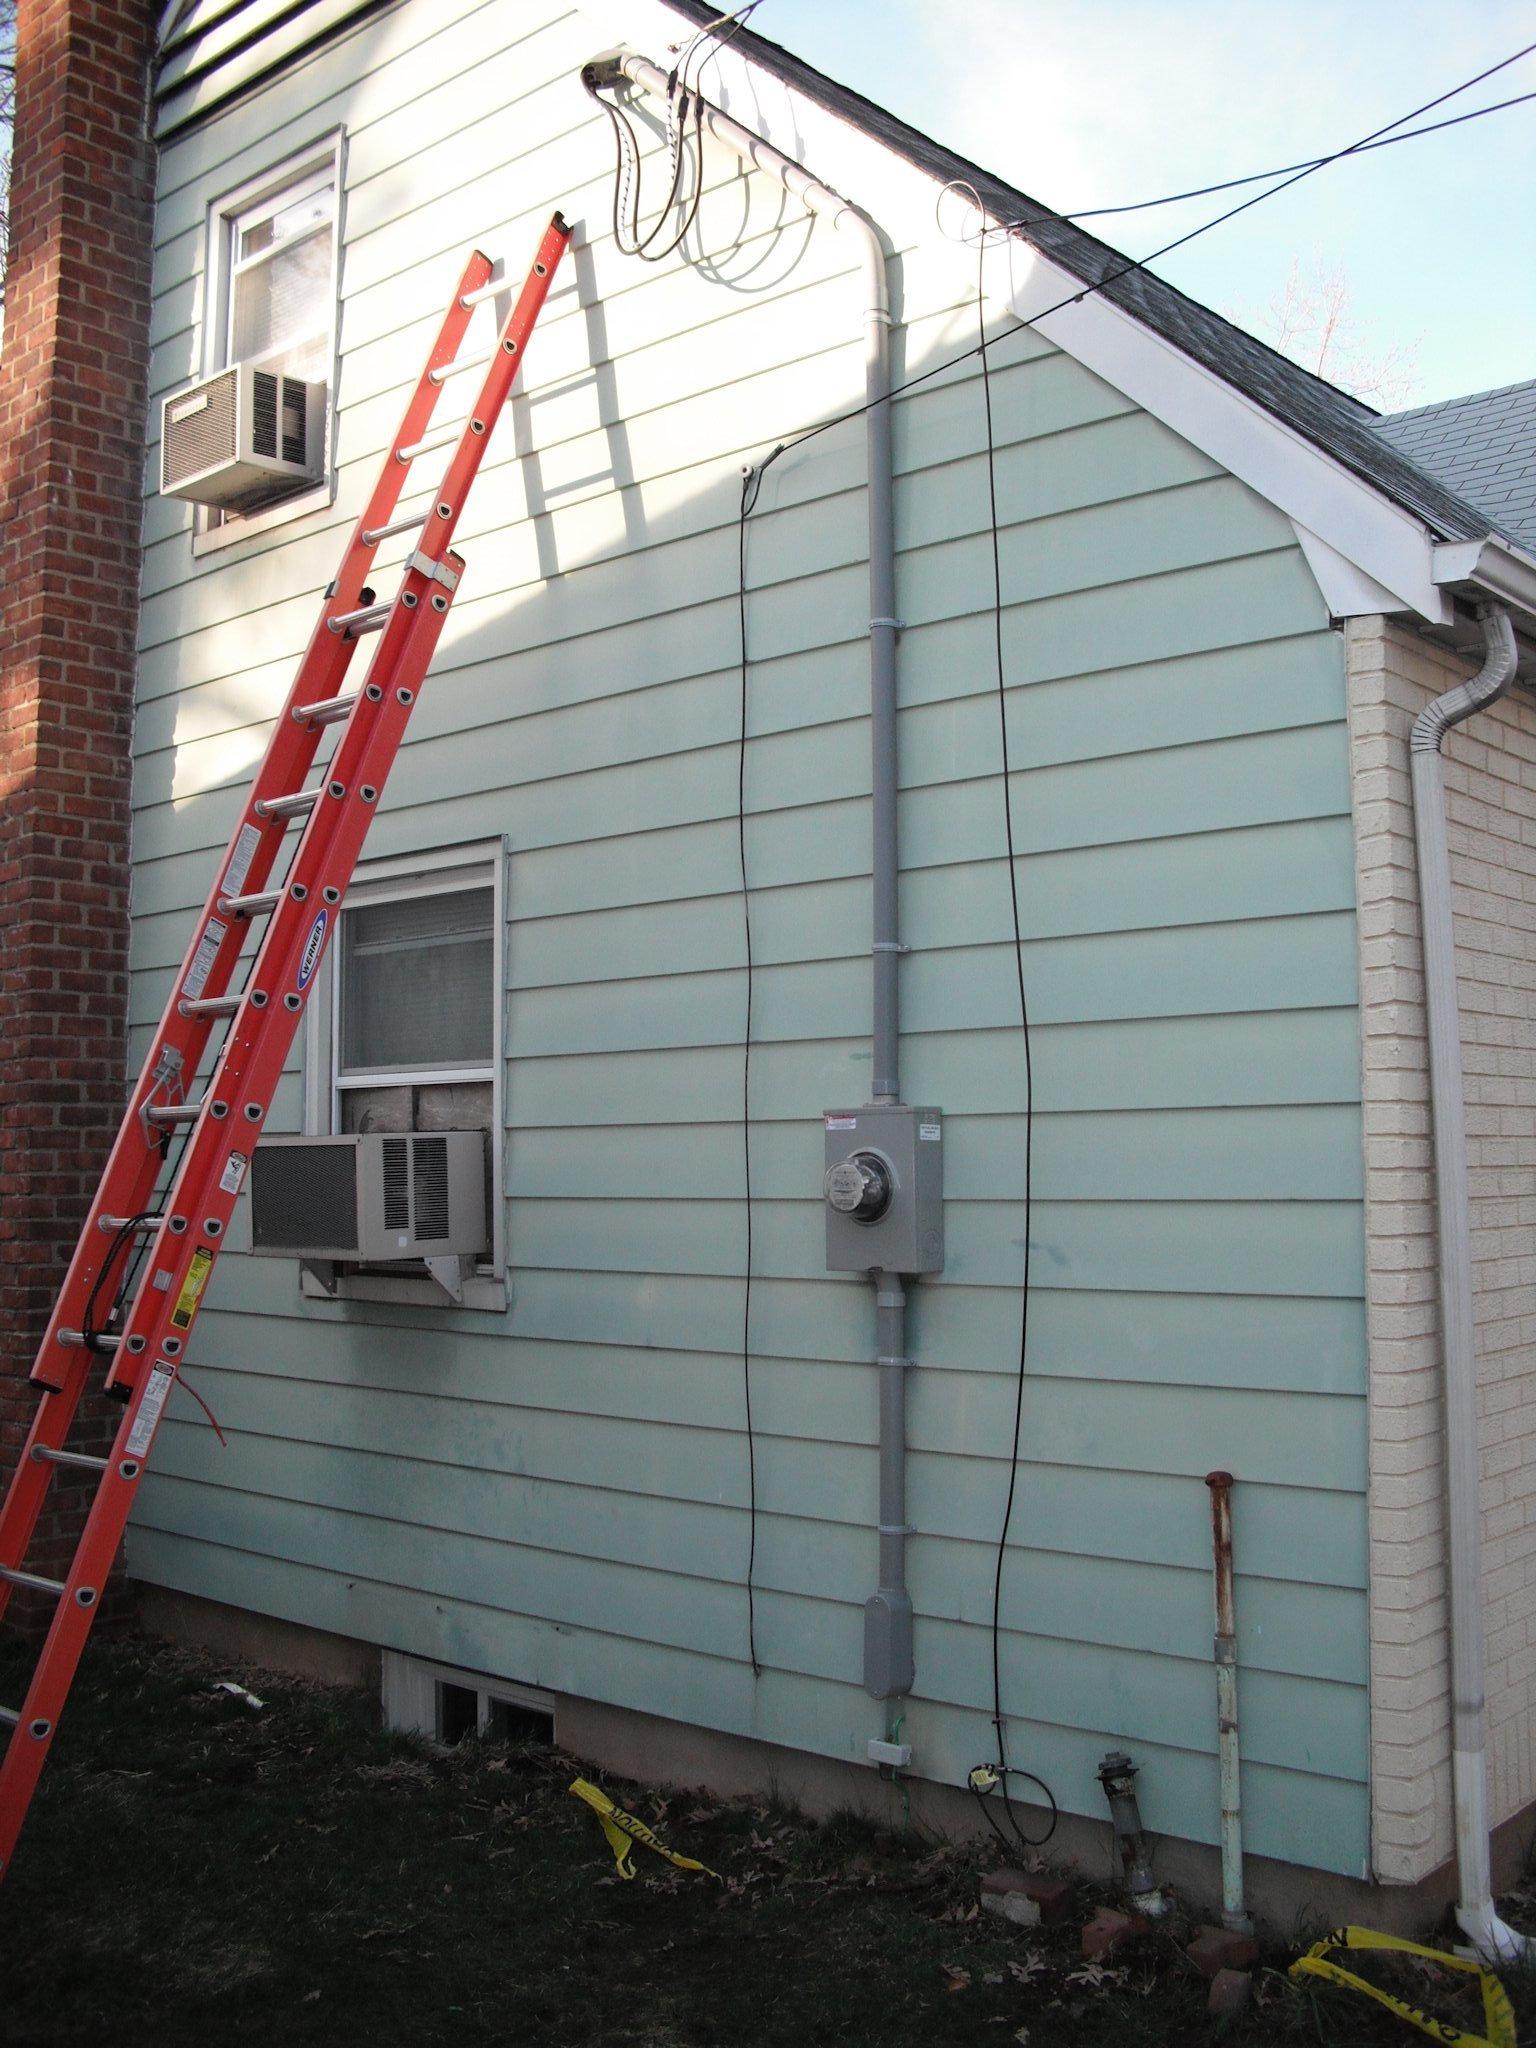 Electrical Wiring Baseboard Heater Installation